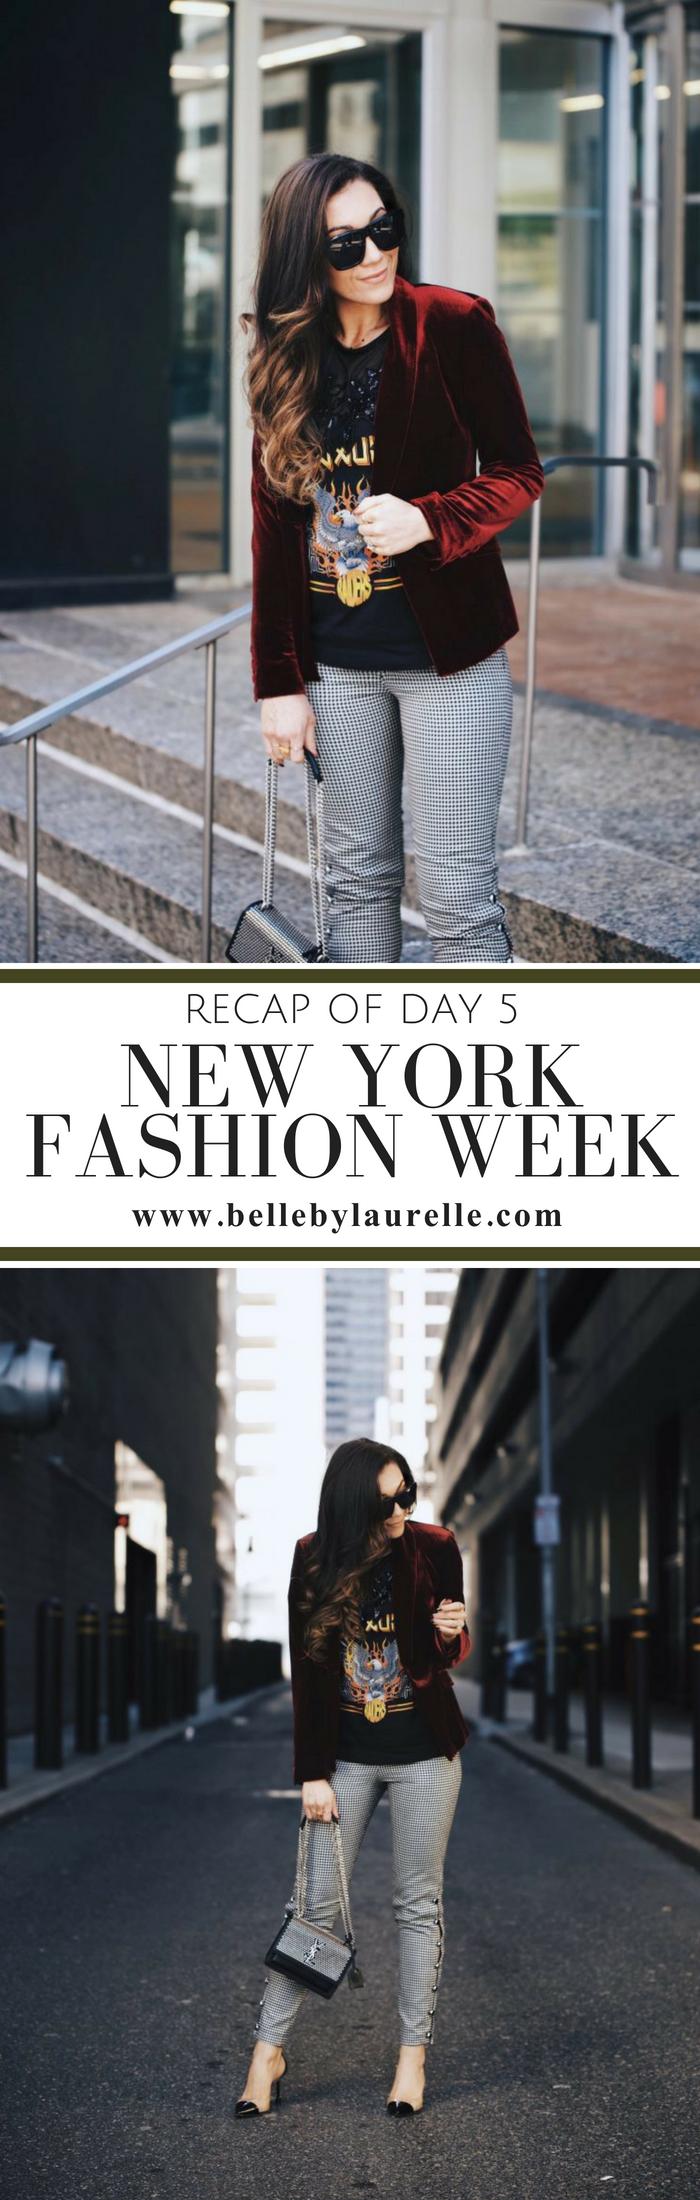 Belle by Laurelle Blog New York Fashion Week Recap